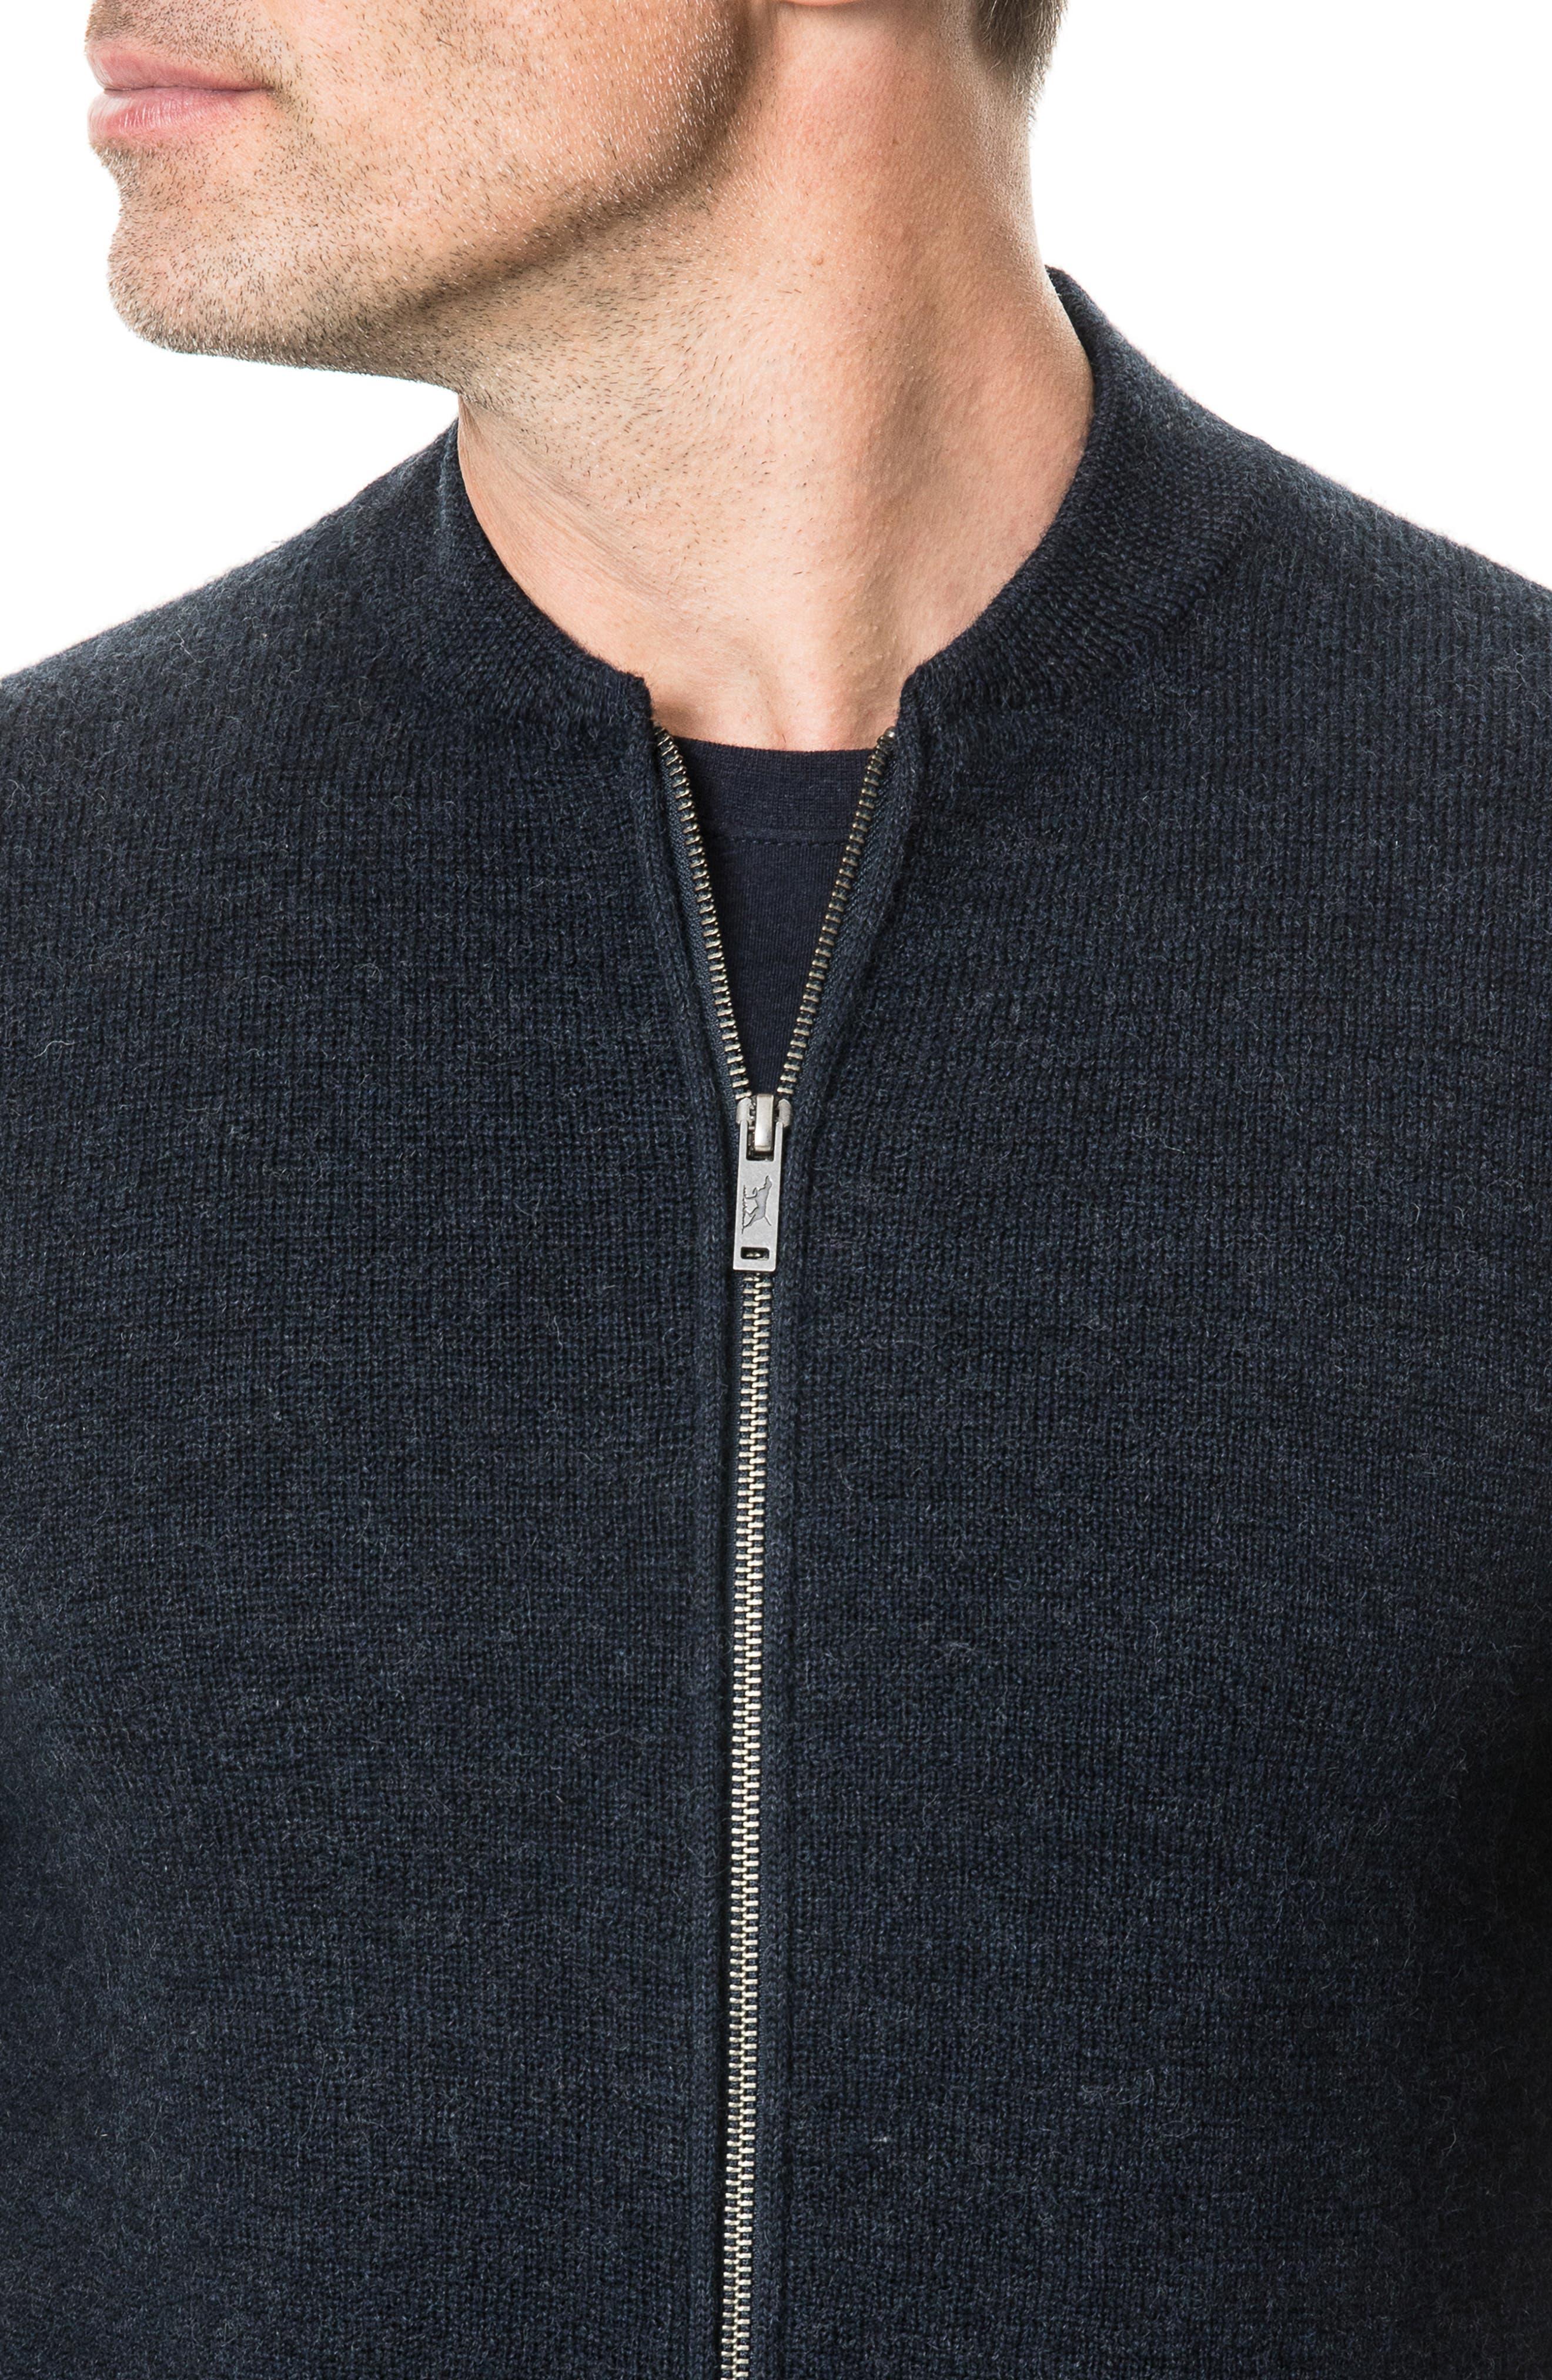 Fairton Regular Fit Wool Zip Front Sweater,                             Alternate thumbnail 3, color,                             NAVY